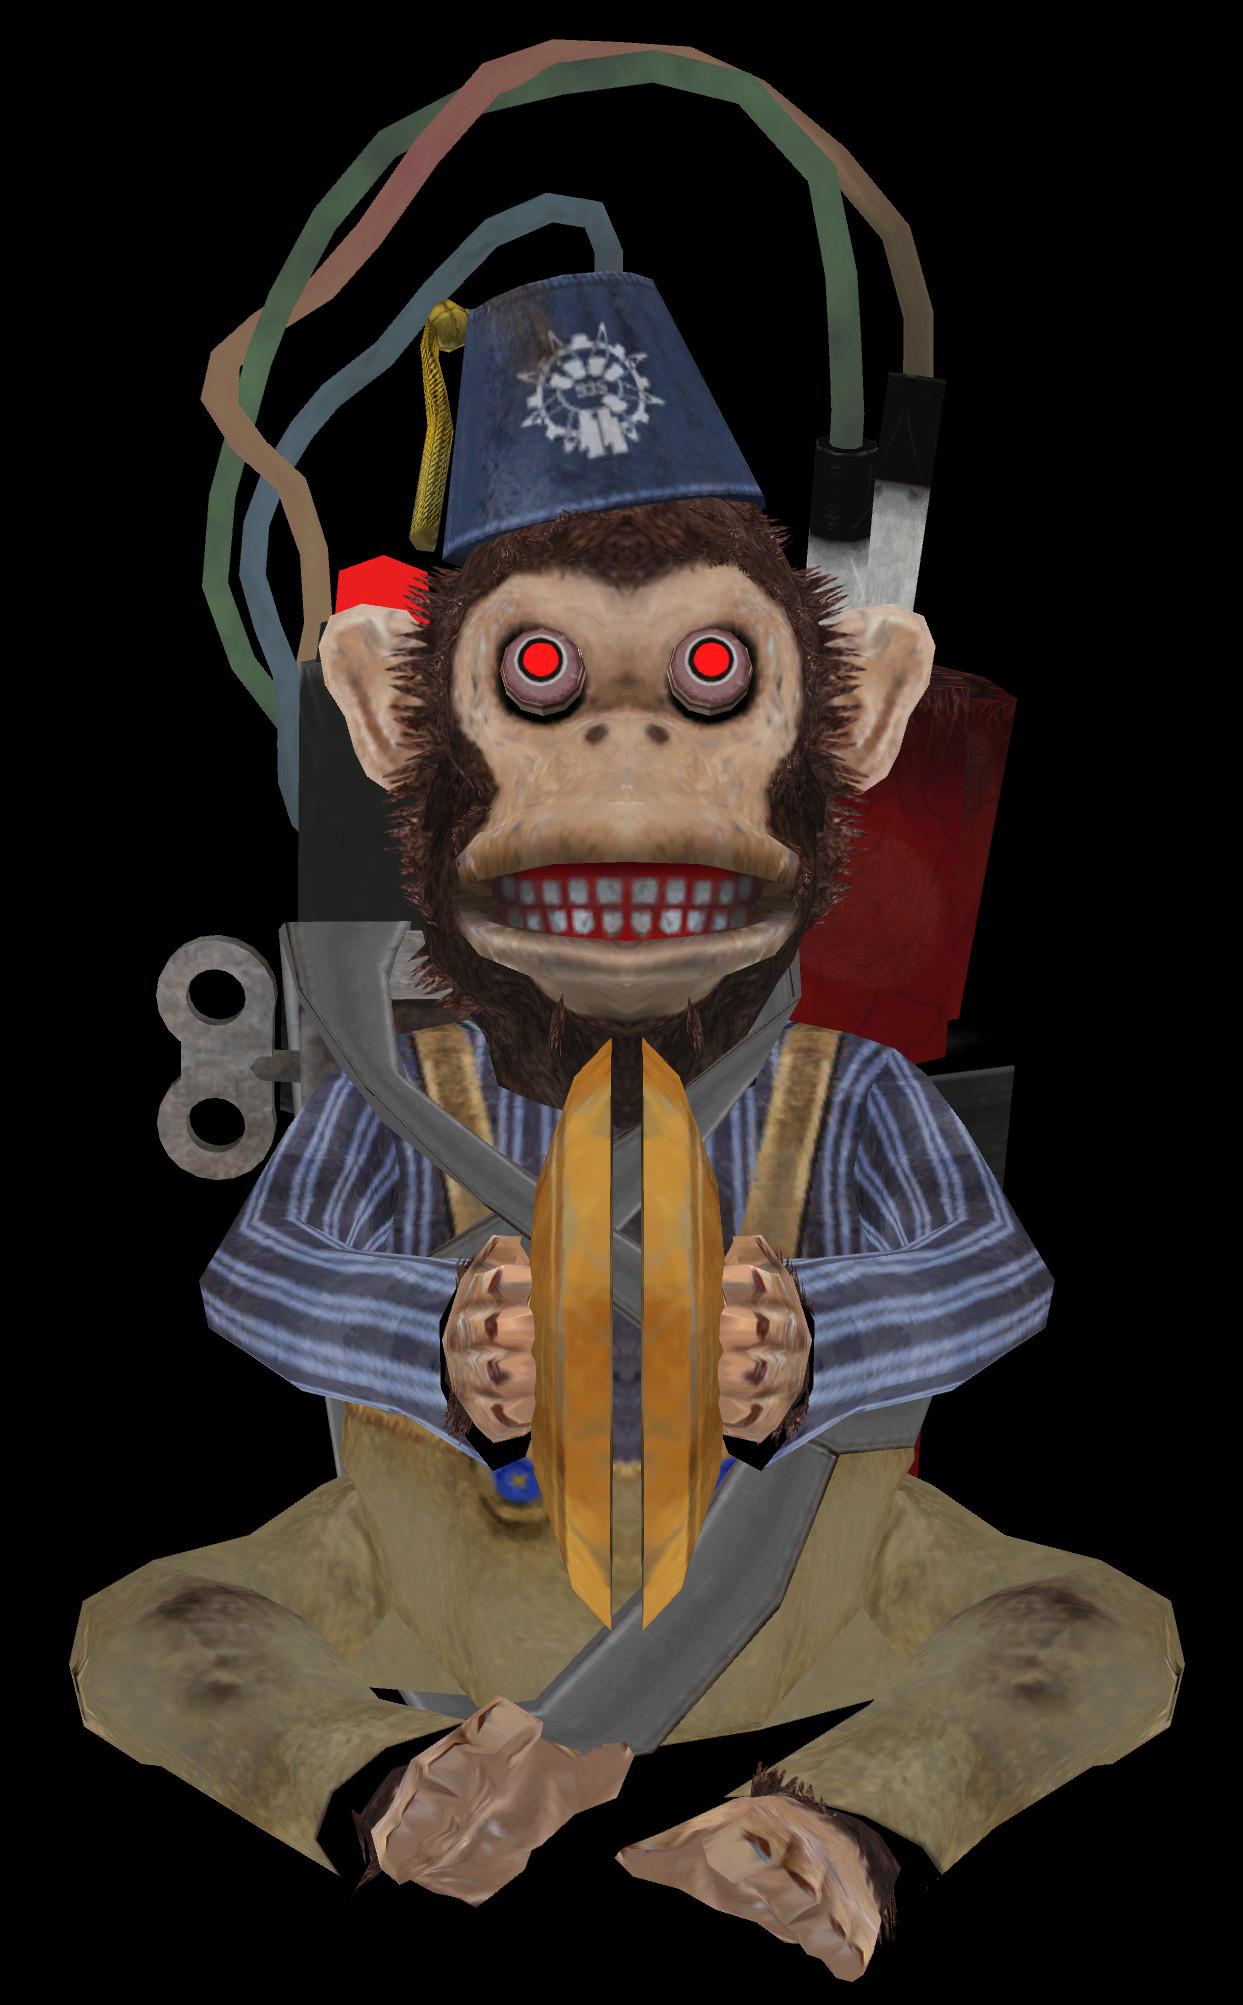 royal albert china vase of monkey bomb call of duty wiki fandom powered by wikia throughout monkey bomb